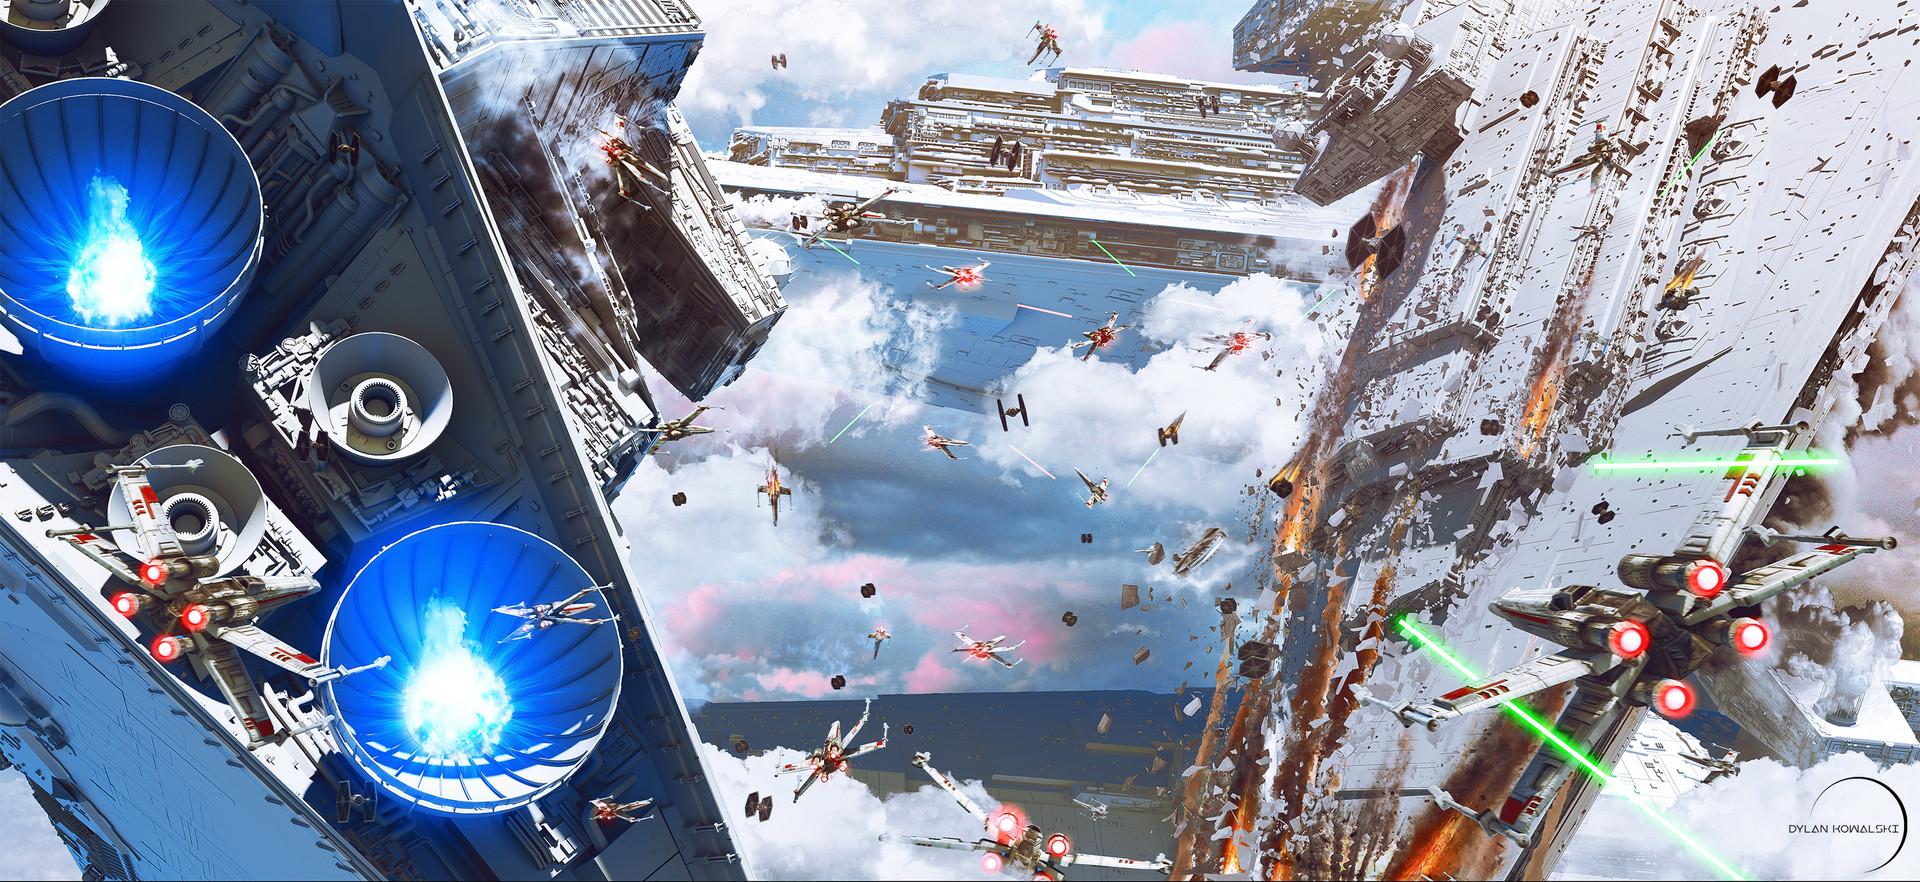 dylan-kowalski-star-wars-rework-2880-web